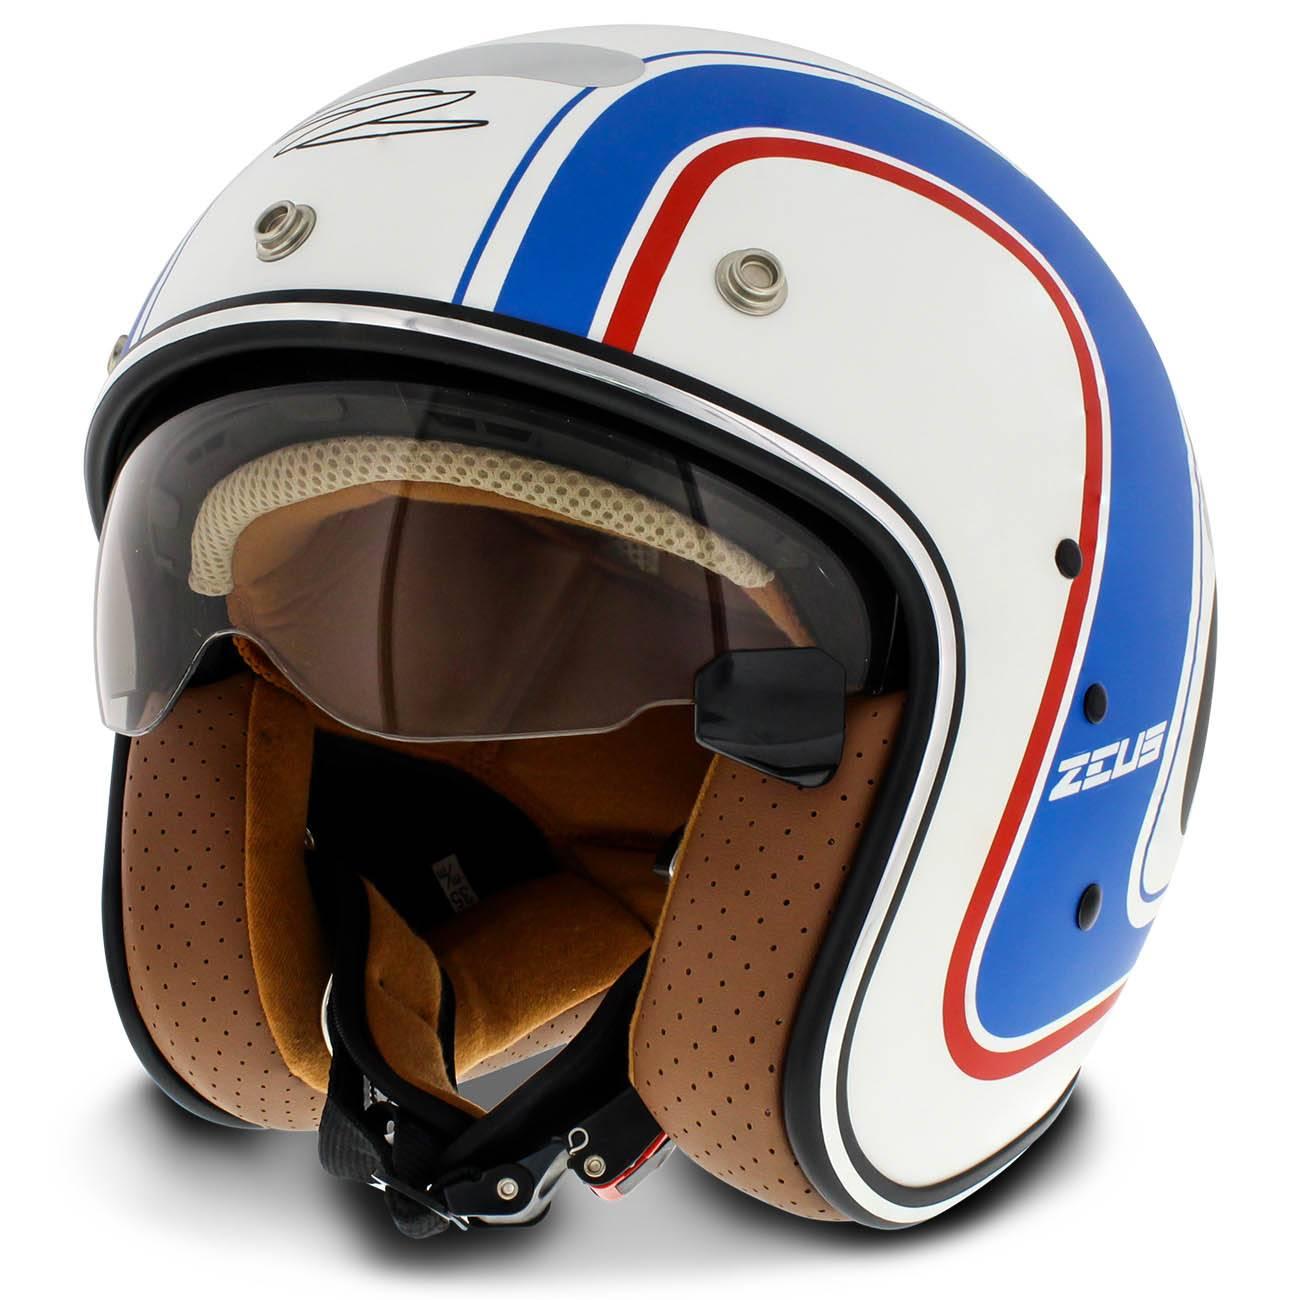 Capacete Aberto Zeus 380Fa Daytona Matt White K36 Blue Branco Fosco Azul Tamanho 56